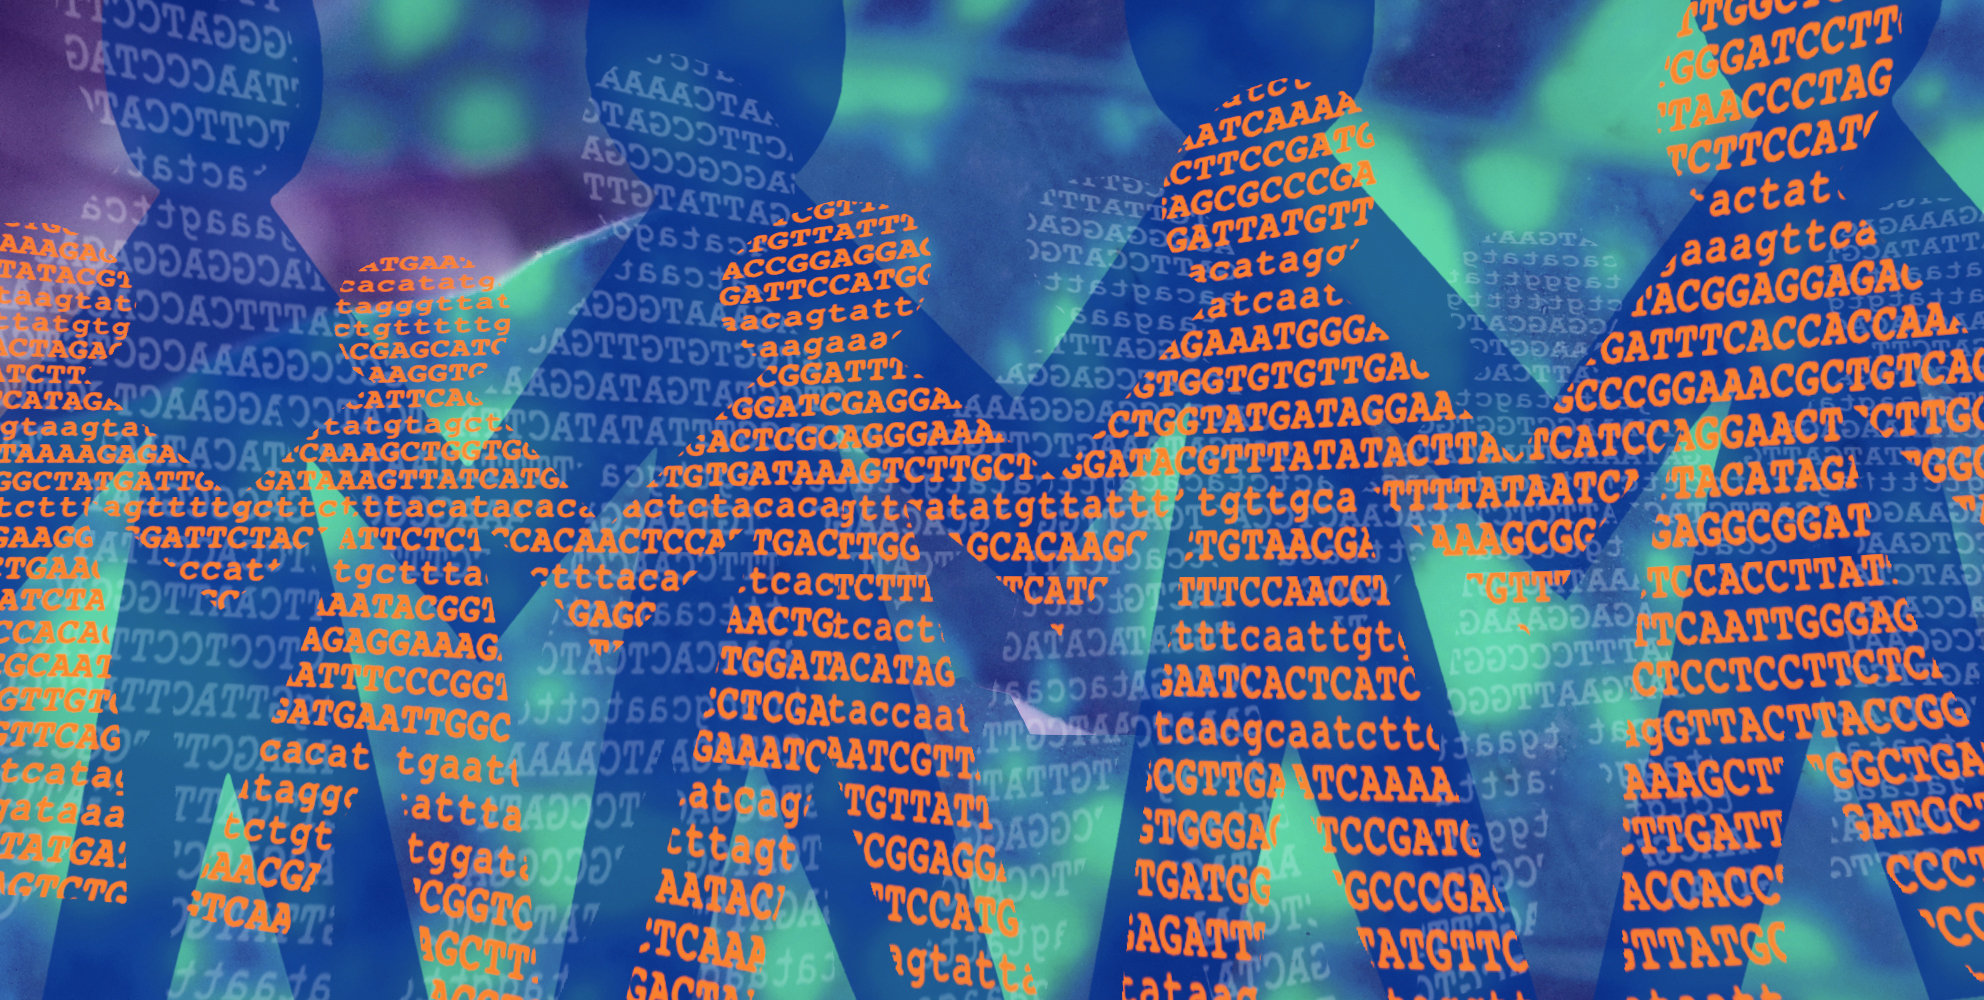 nist builds statistical foundation for next generation forensic dna